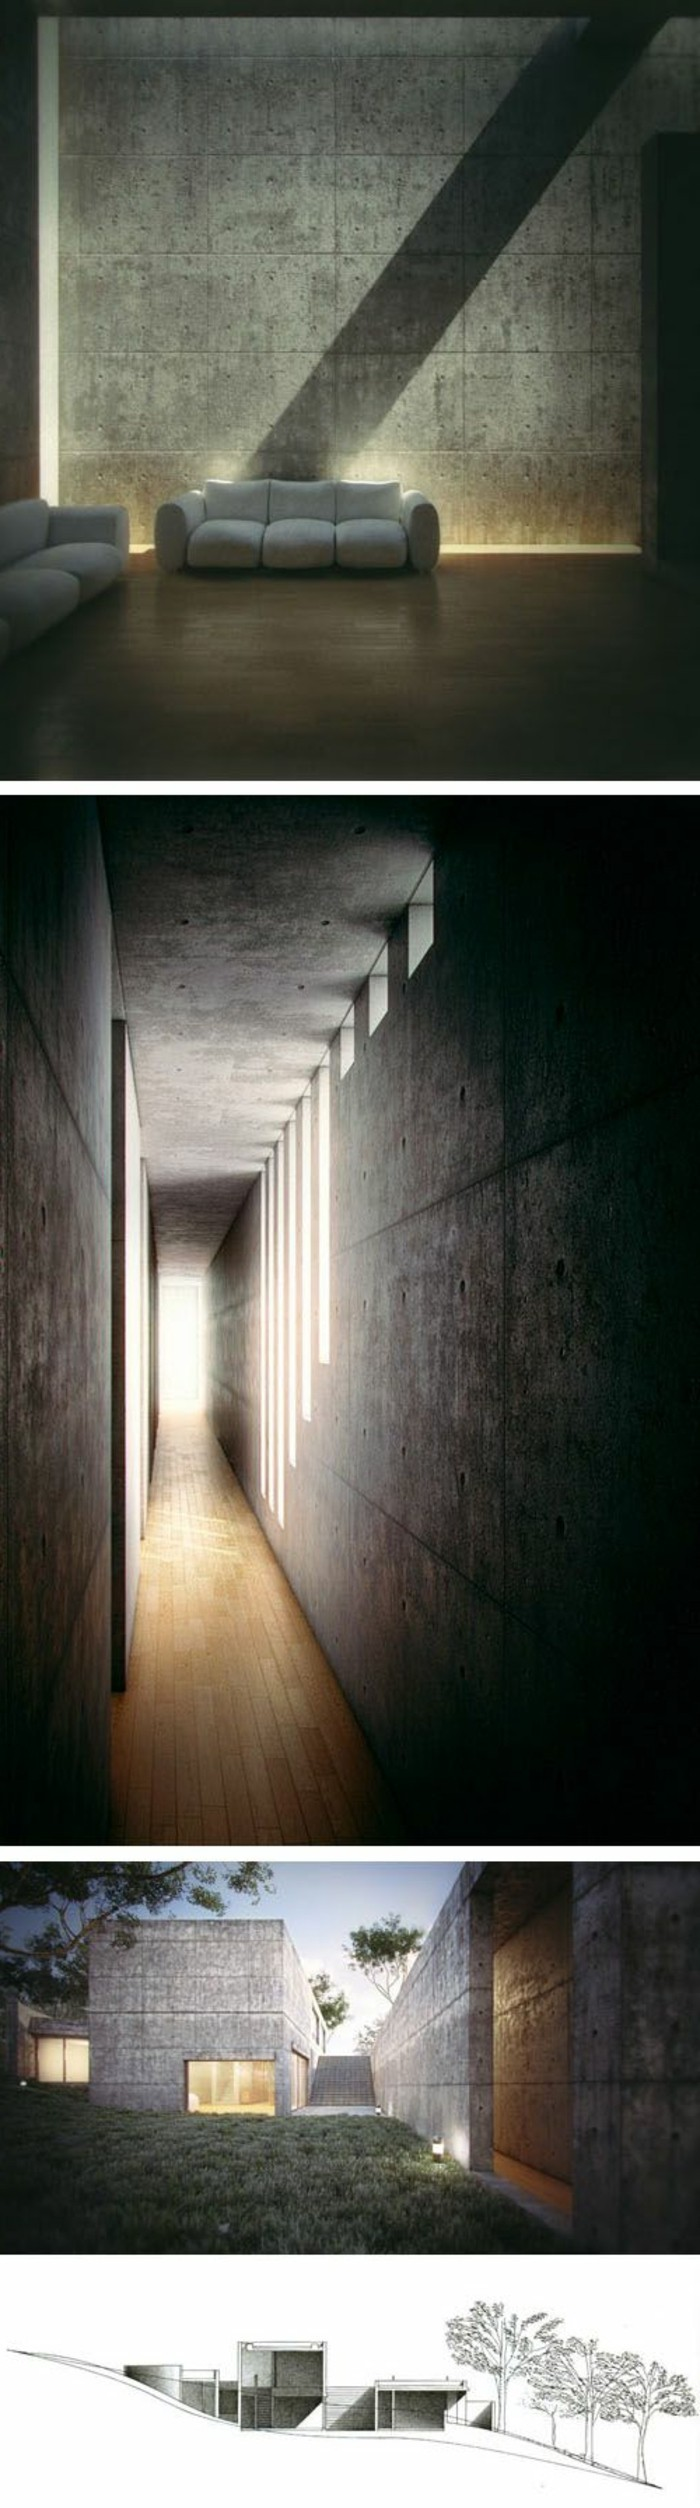 106-Luminaires couloir. Trois variantes.